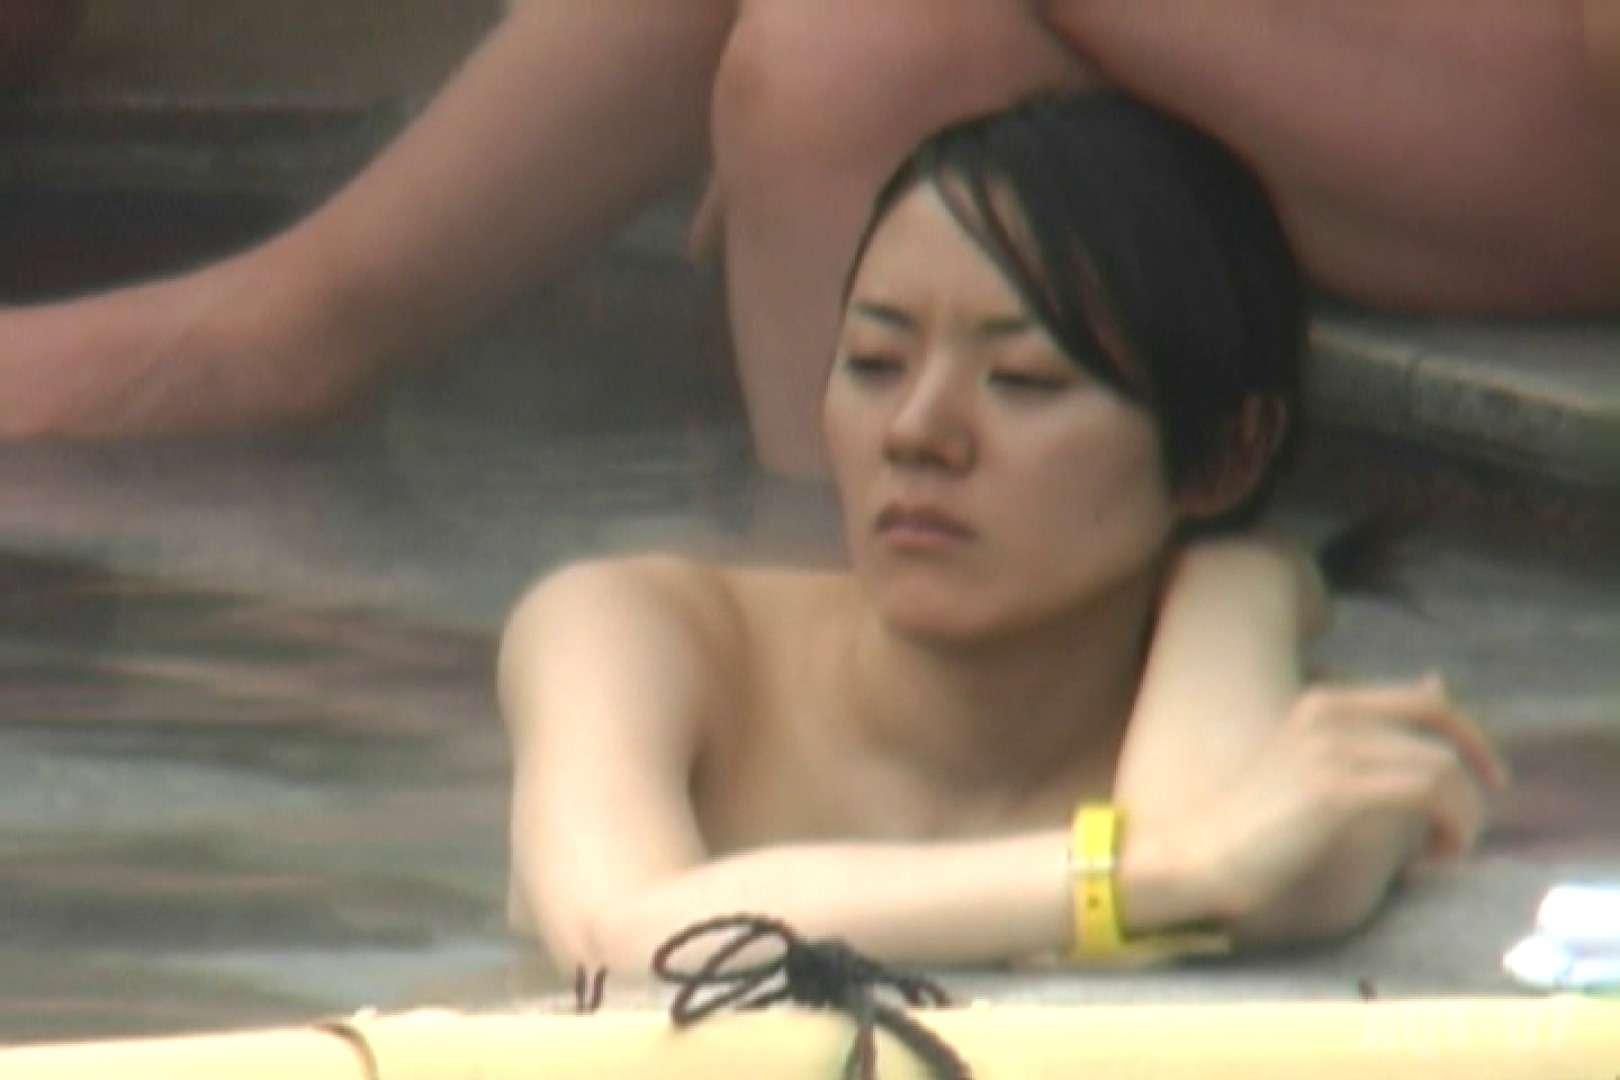 Aquaな露天風呂Vol.765 OLセックス 覗きおまんこ画像 77画像 26